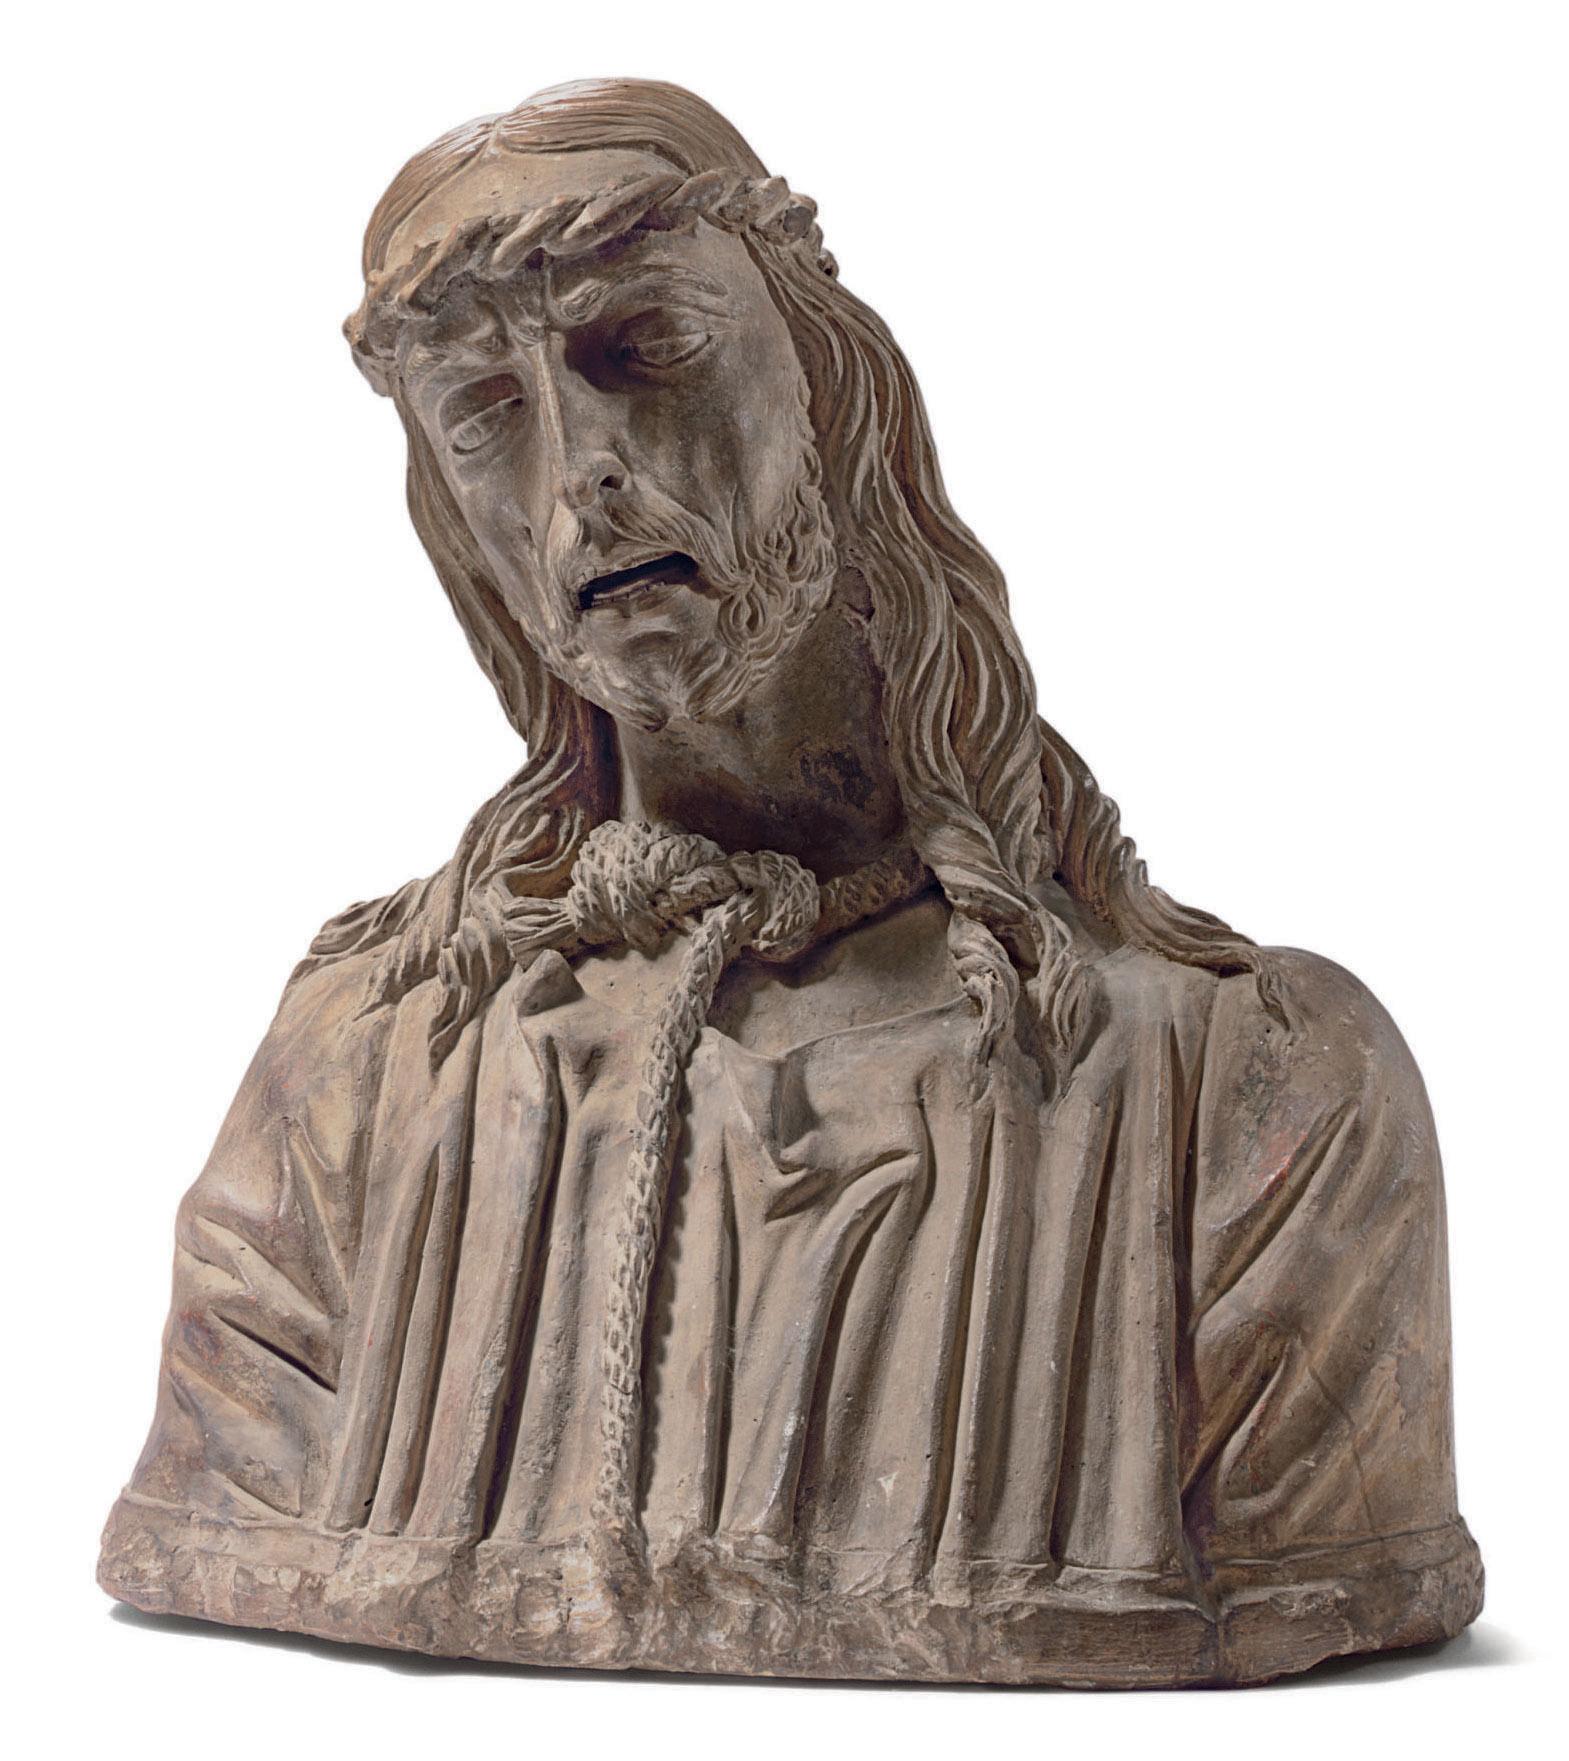 A TERRACOTTA BUST OF CHRIST AS